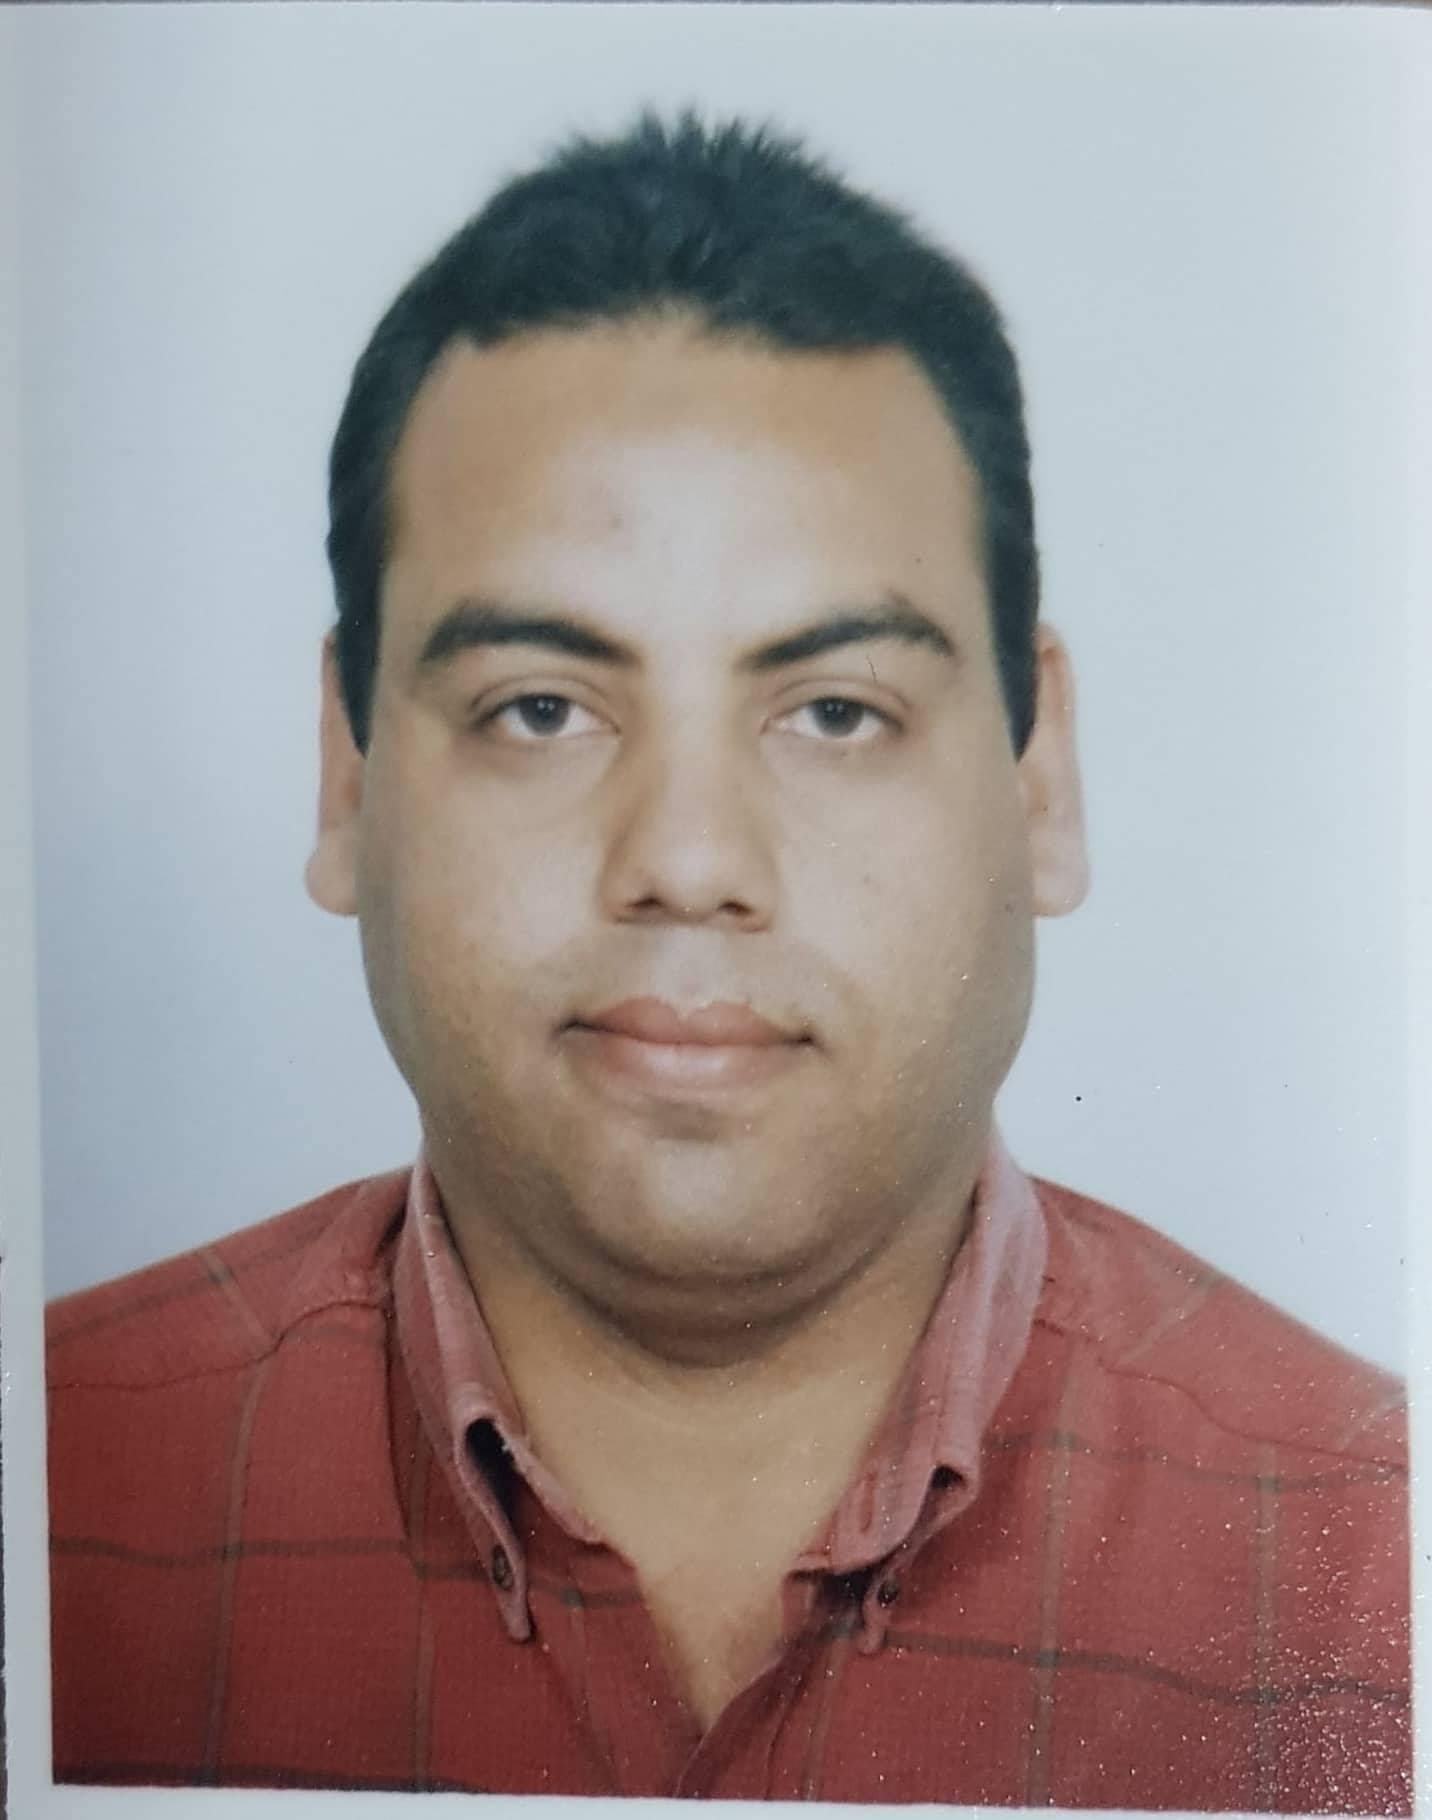 omar_ahmed1675